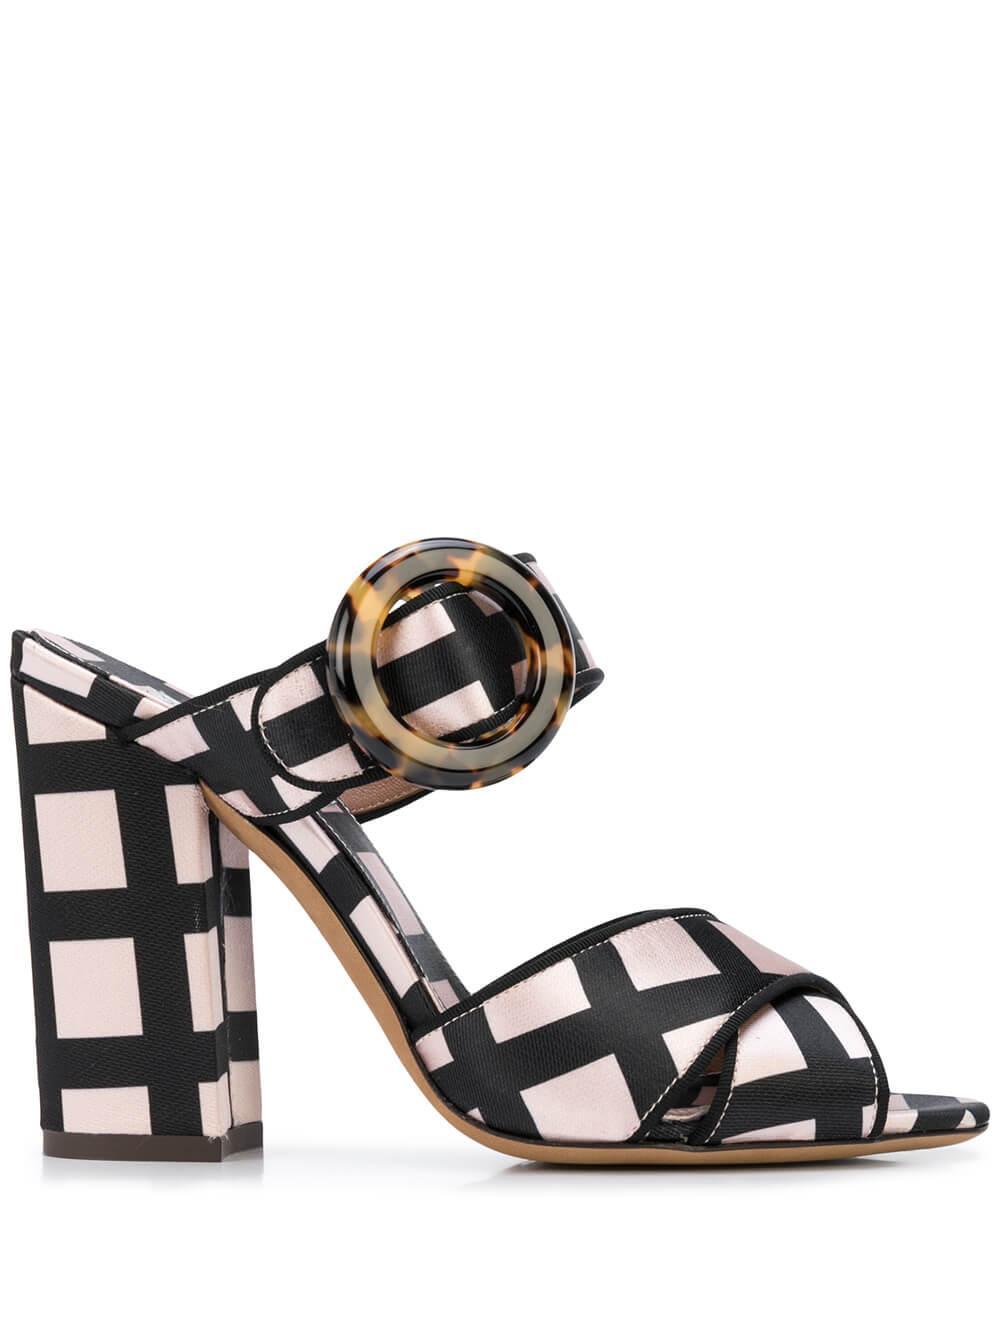 Reyner Check Satin Block Heel Sandal Item # REYNER